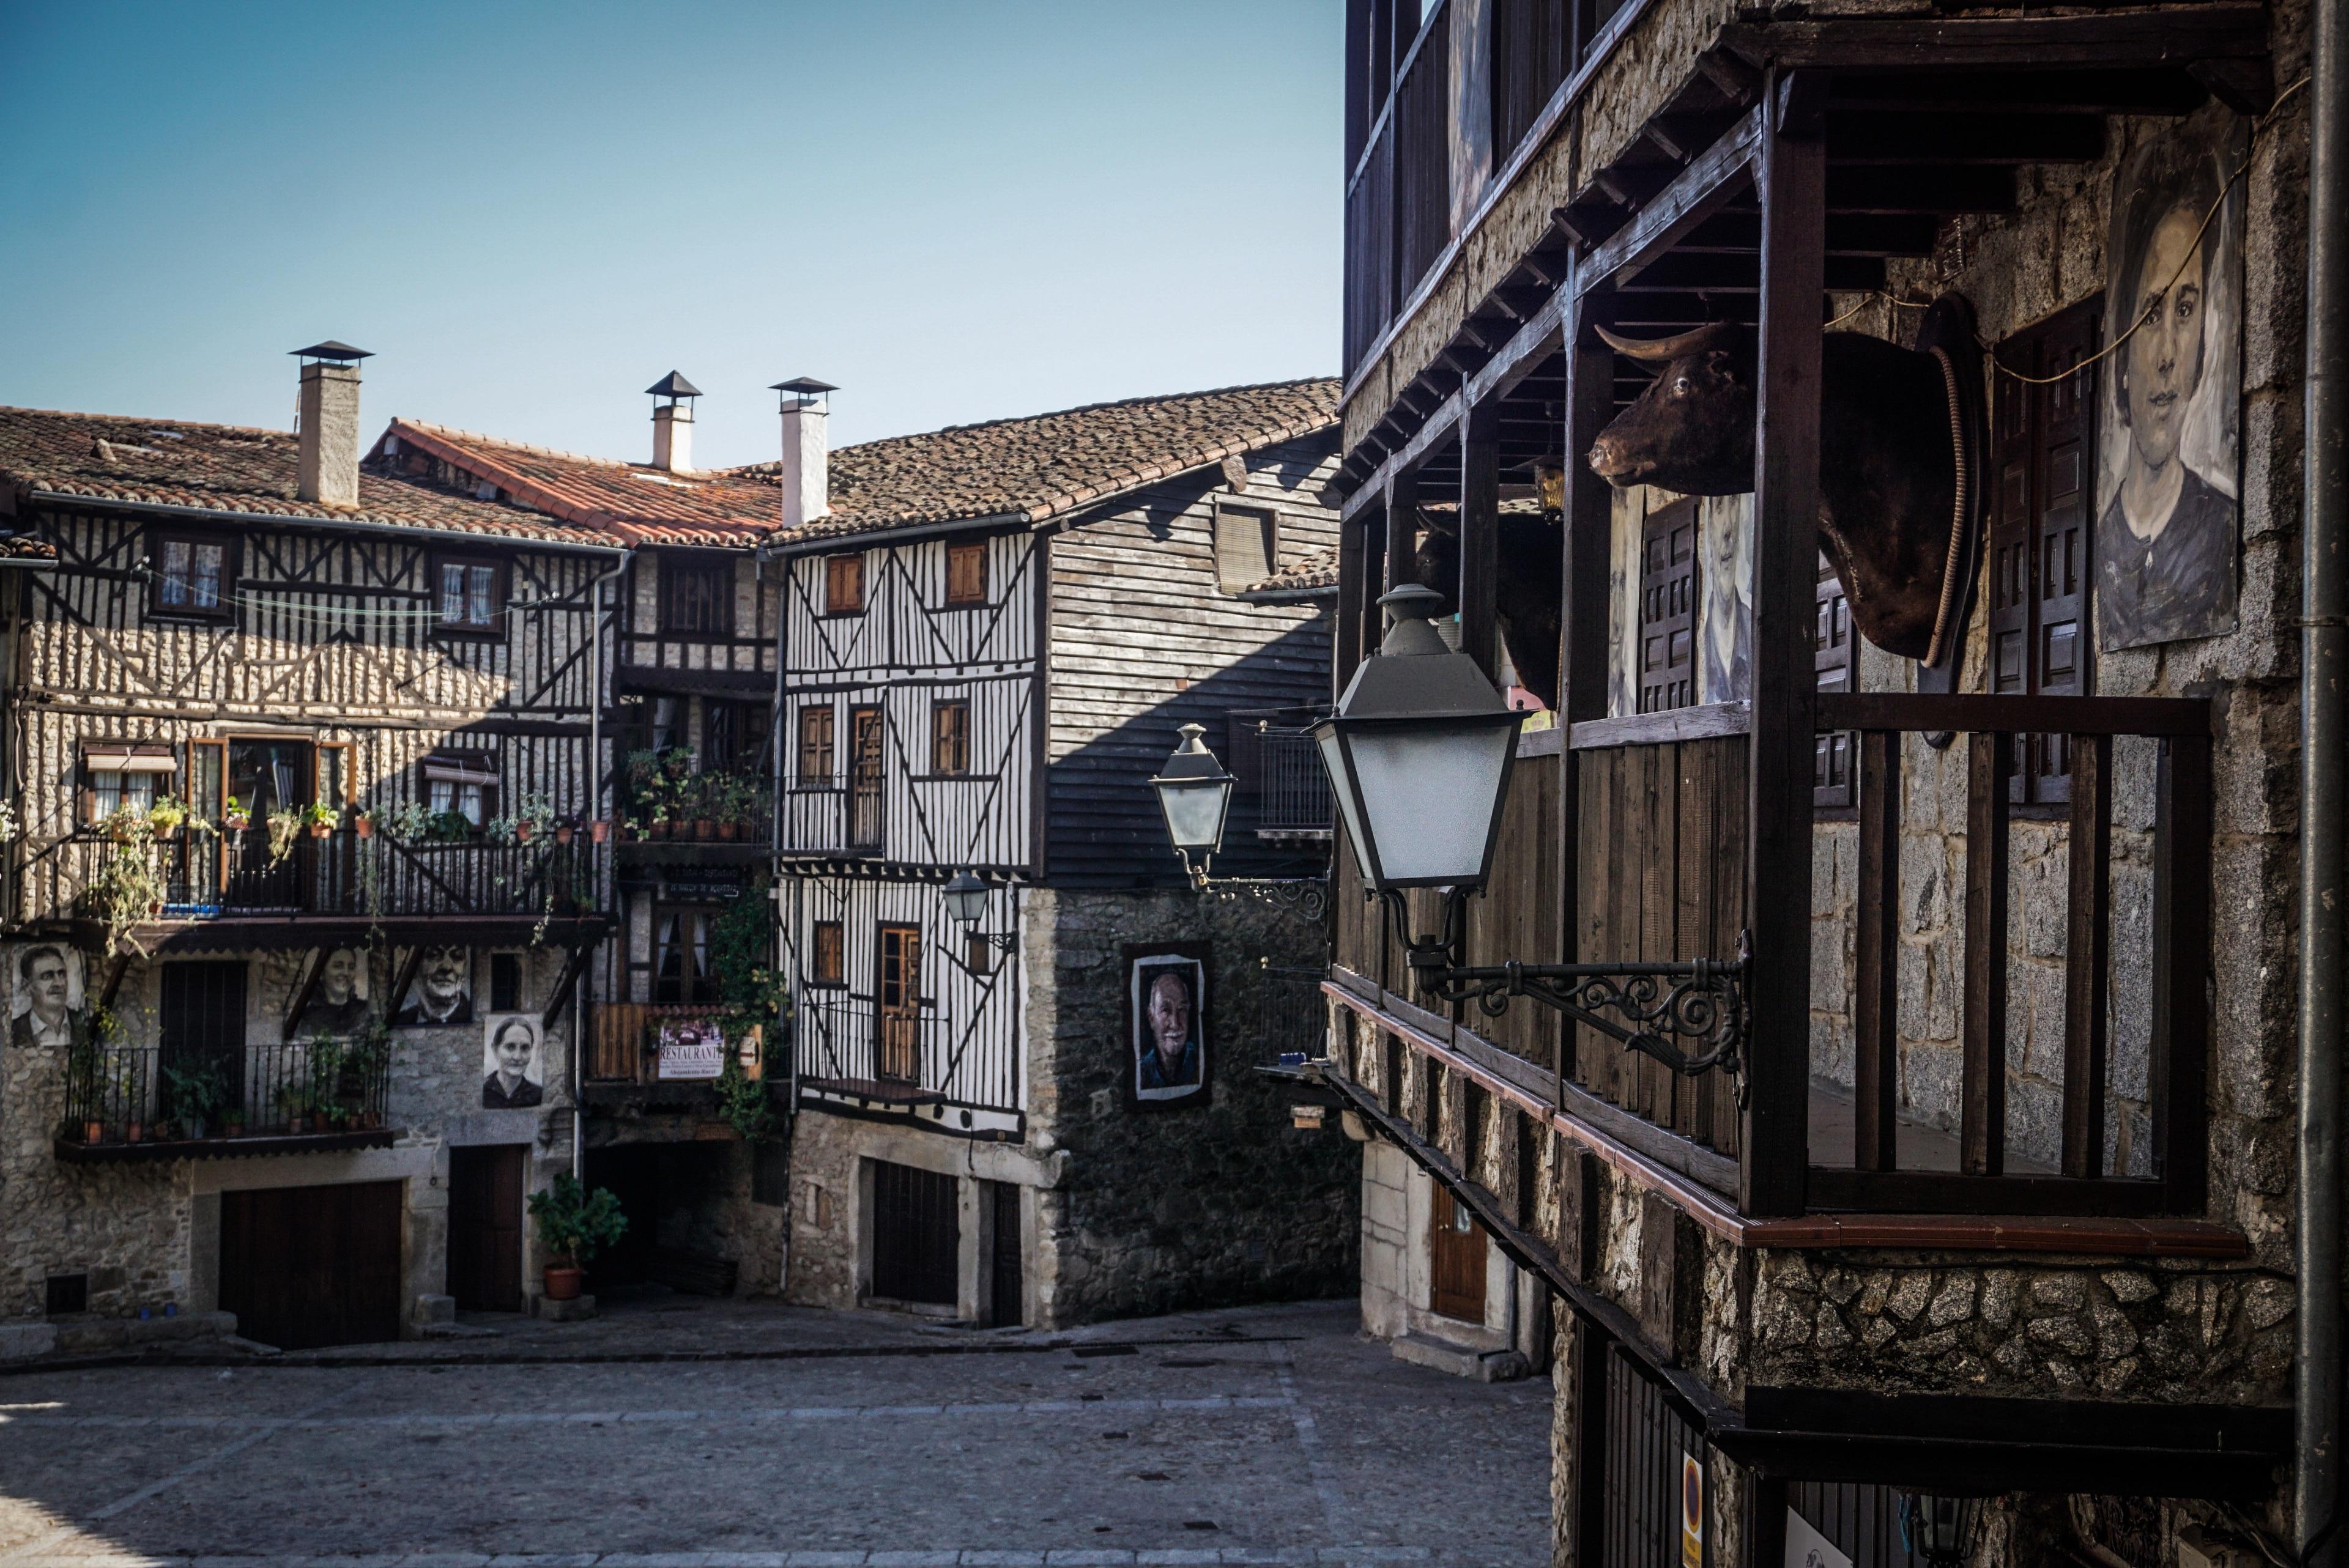 Mogarraz, Castile and Leon, Spain